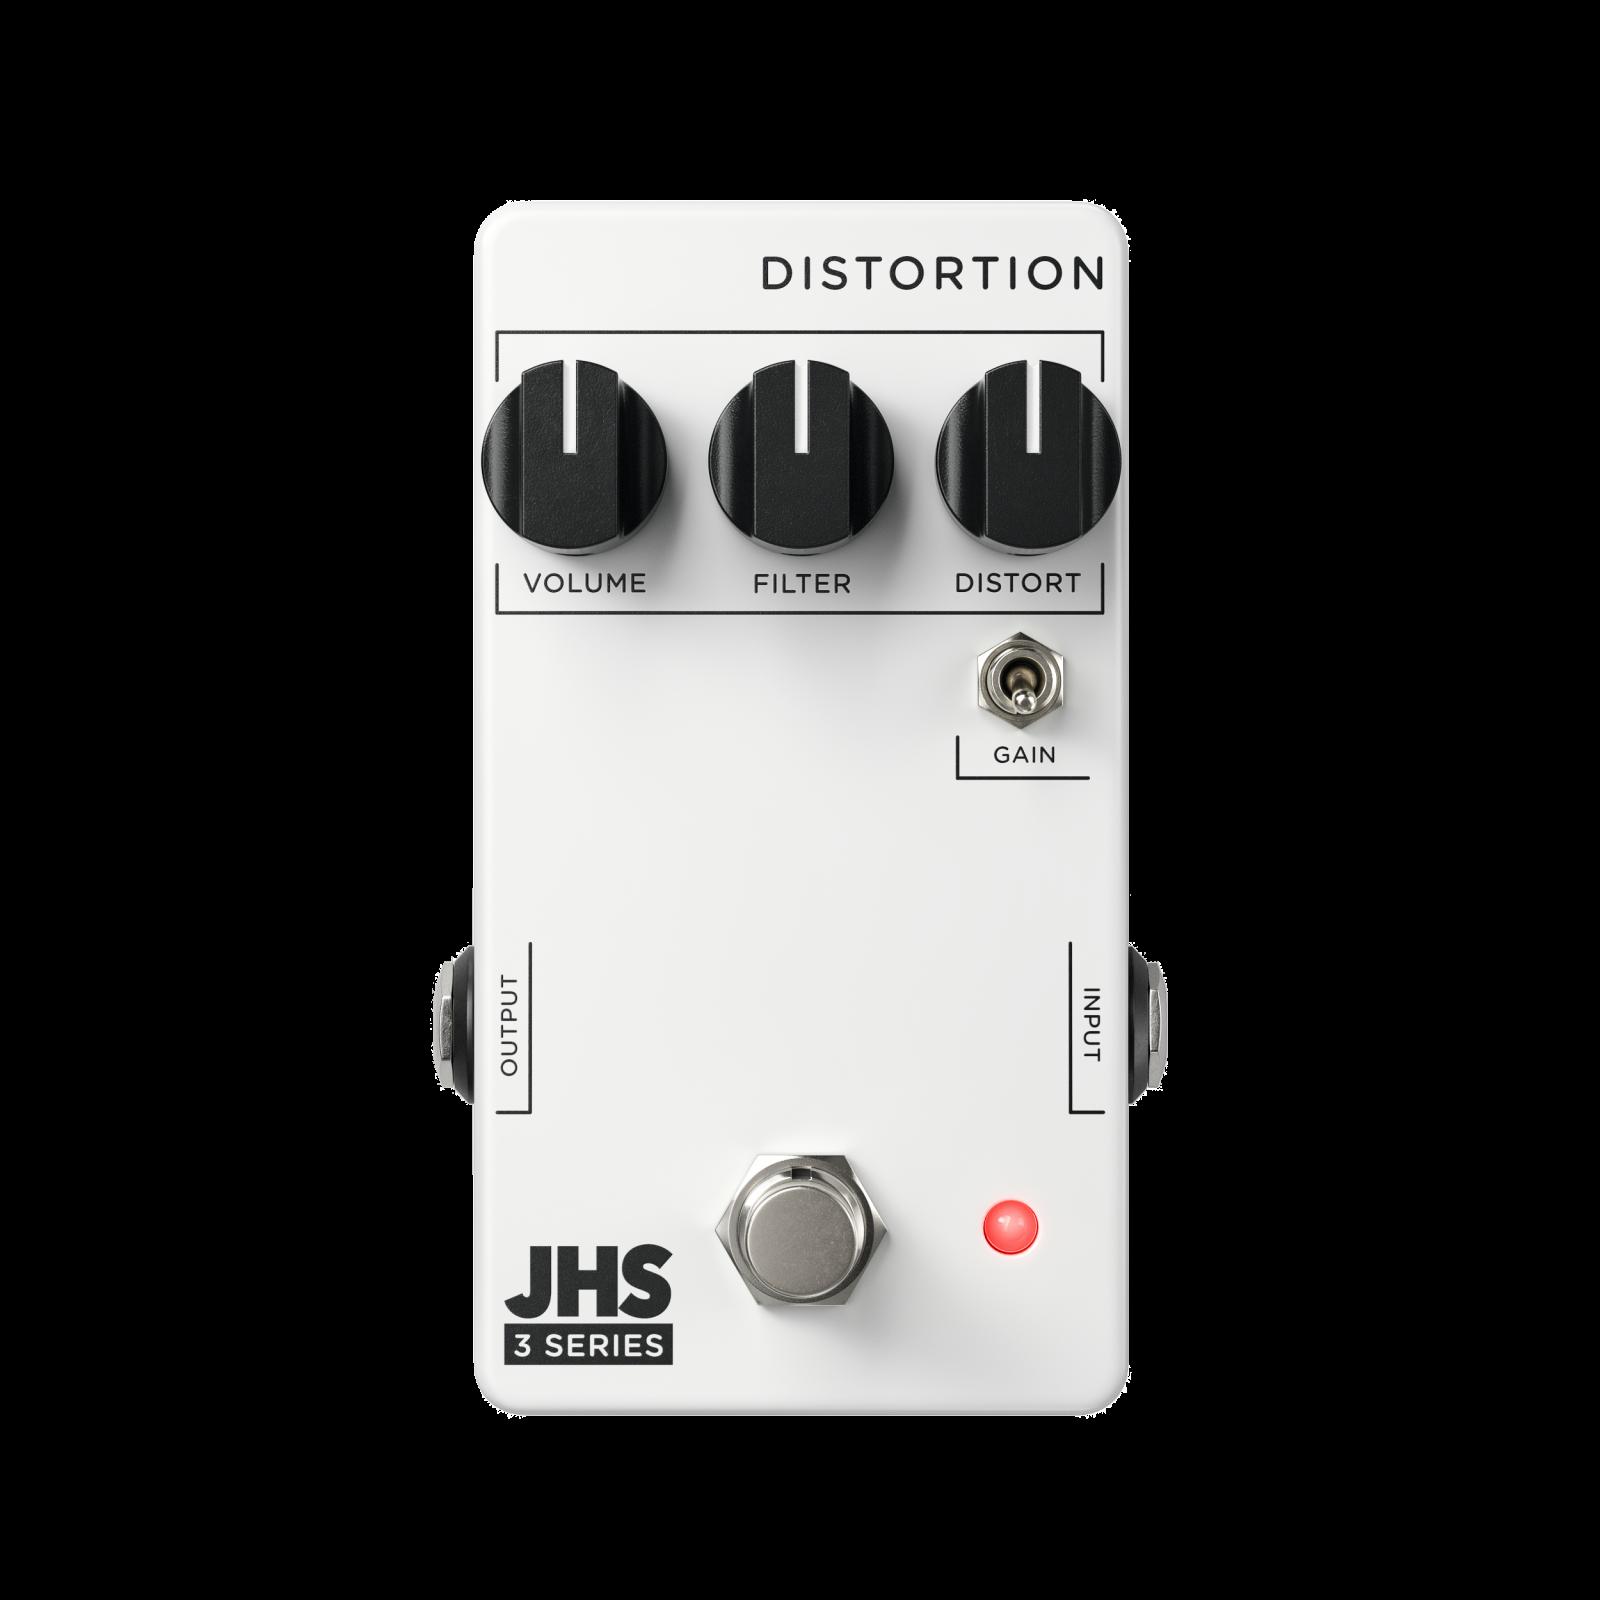 JHS 3 Series Distortion Pedal